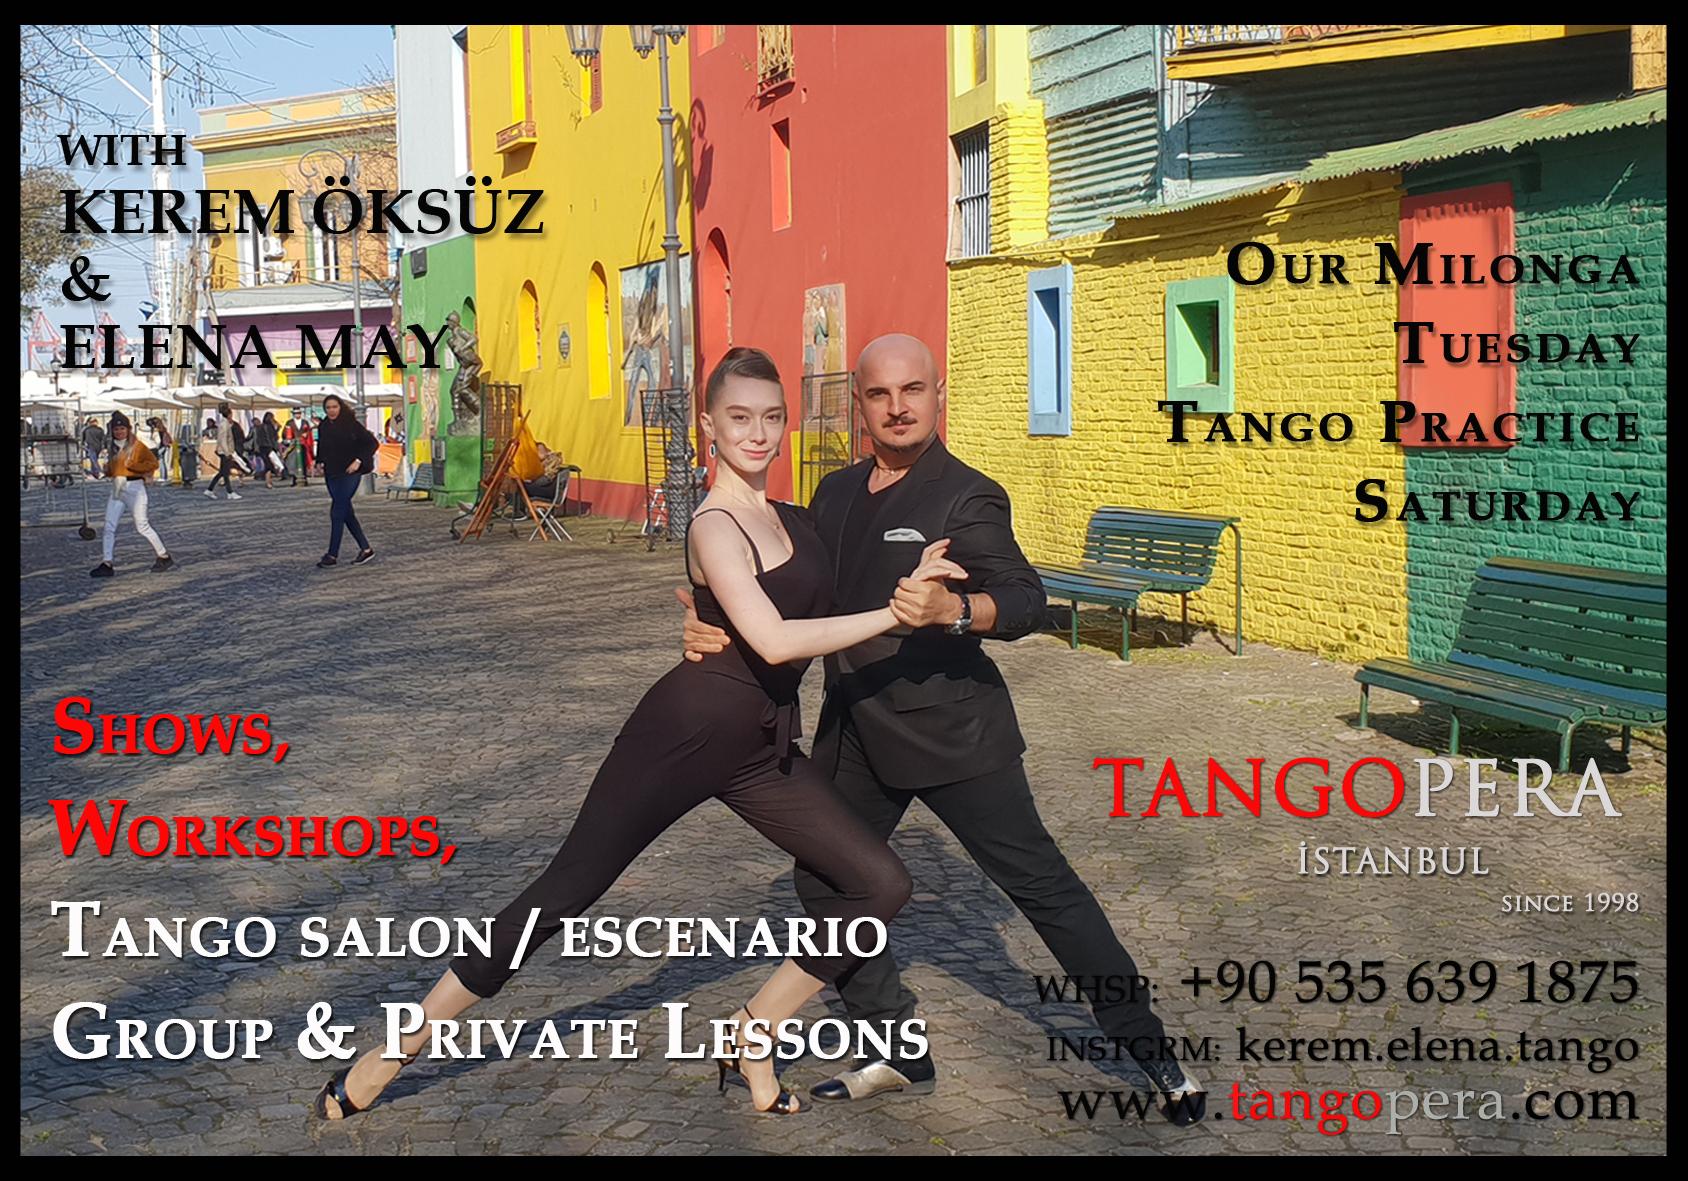 TANGOPERA Tango Guide 2019 -SON.jpg